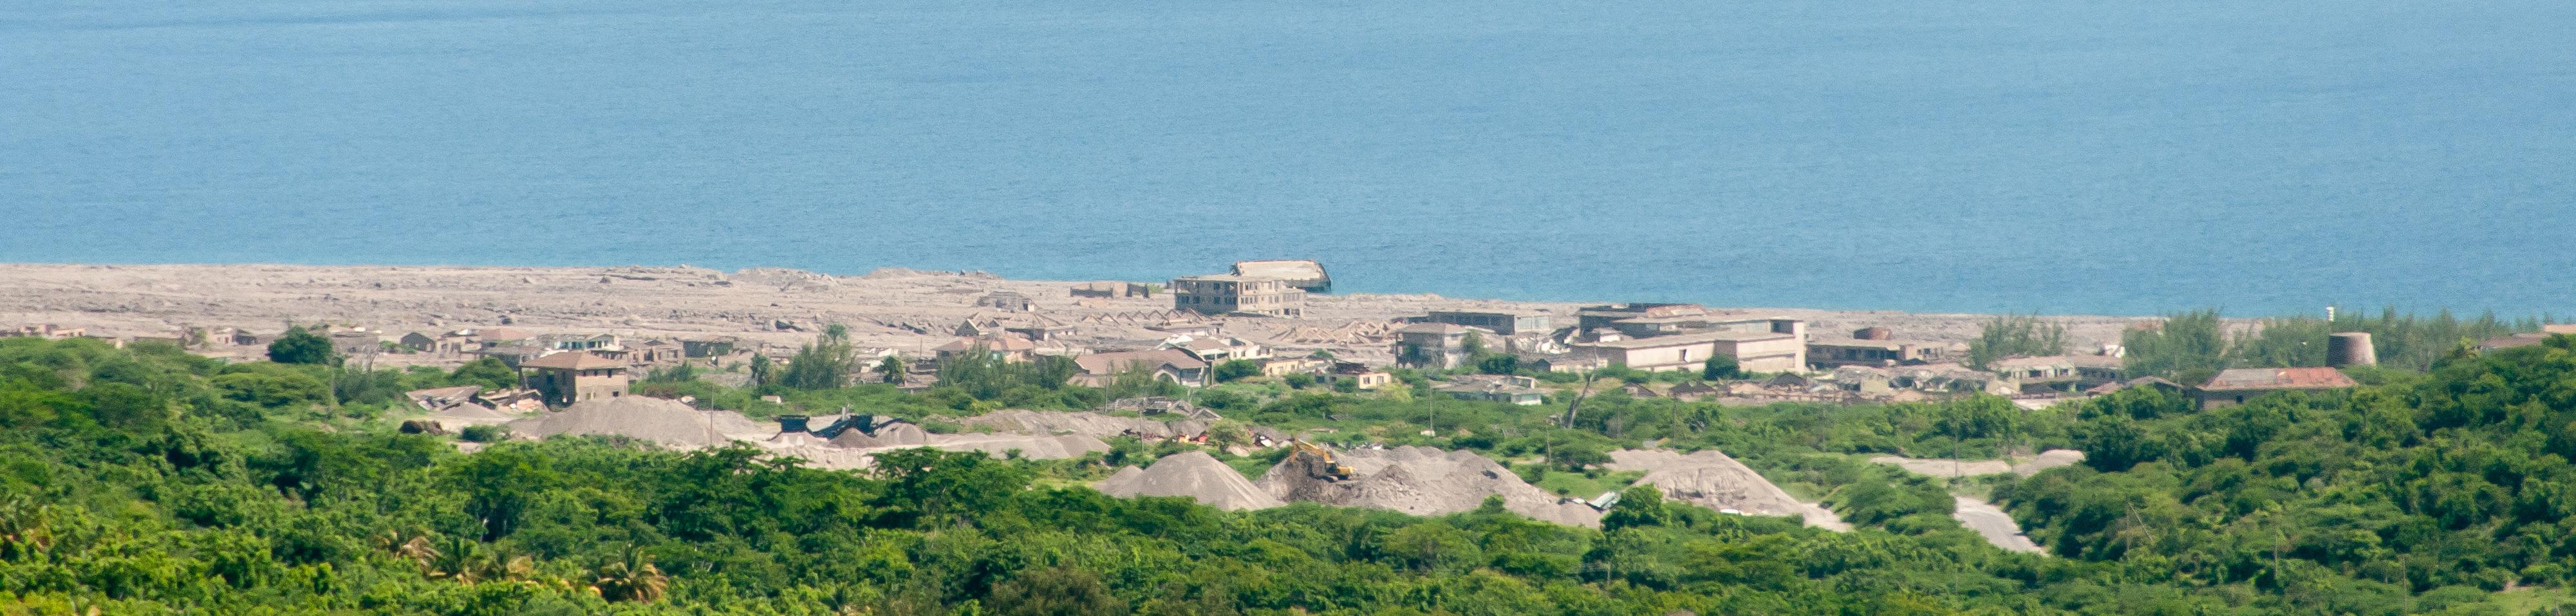 Panorama of the island of Montserrat